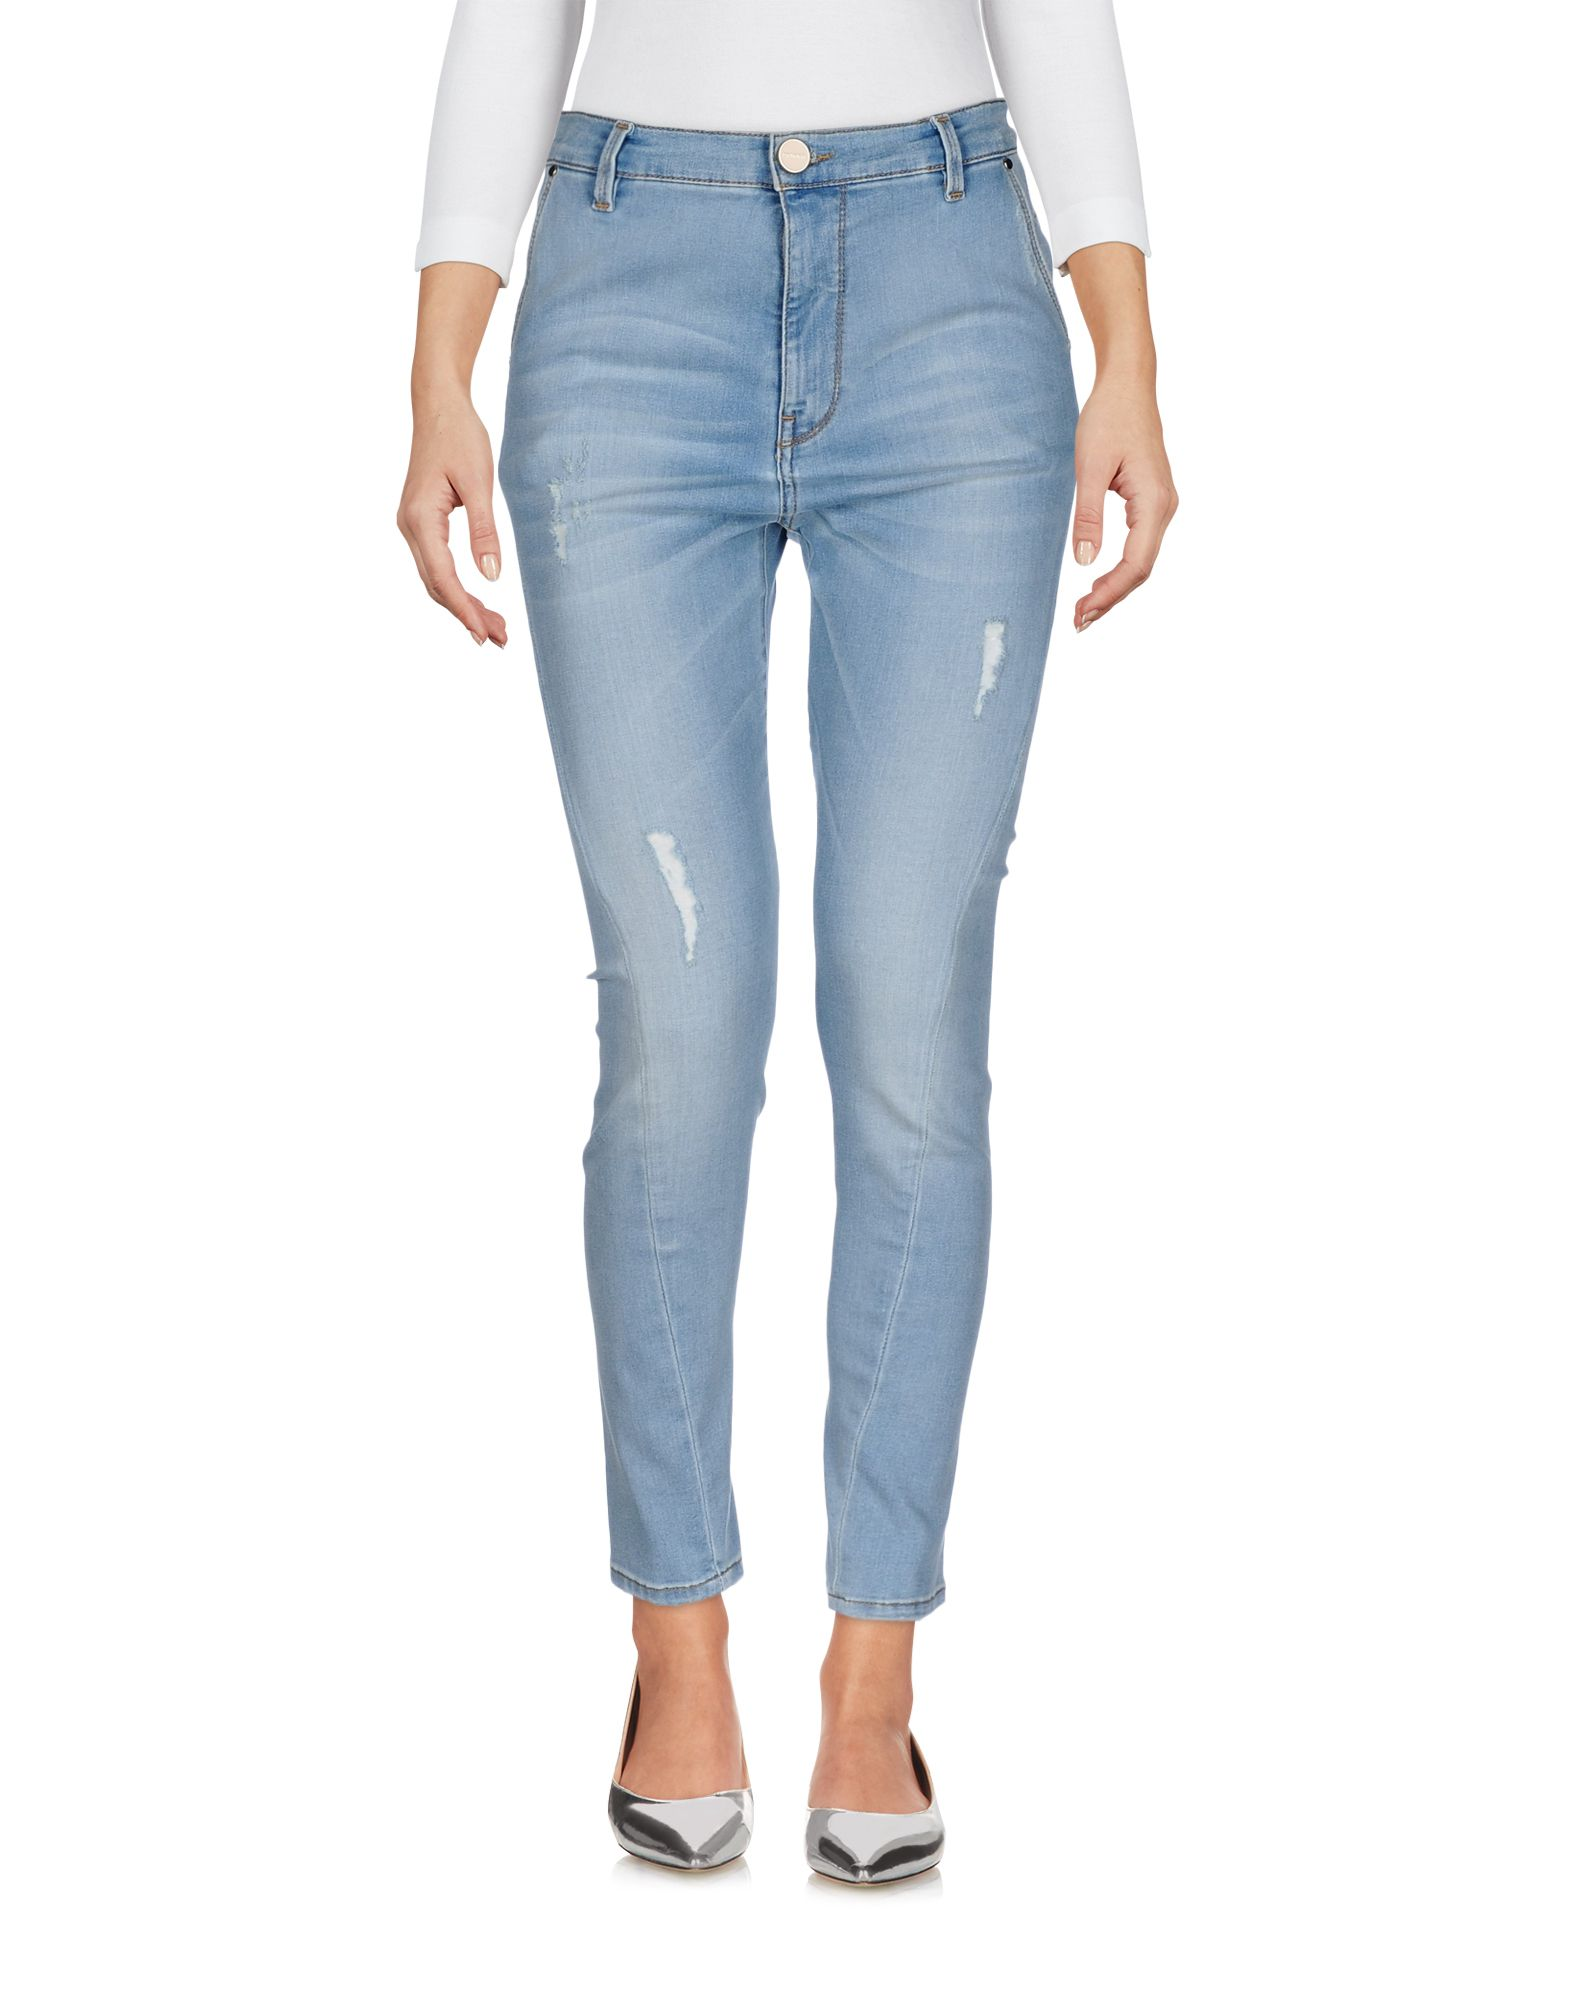 Pantaloni Jeans Pinko Donna - Acquista online su WmpFM